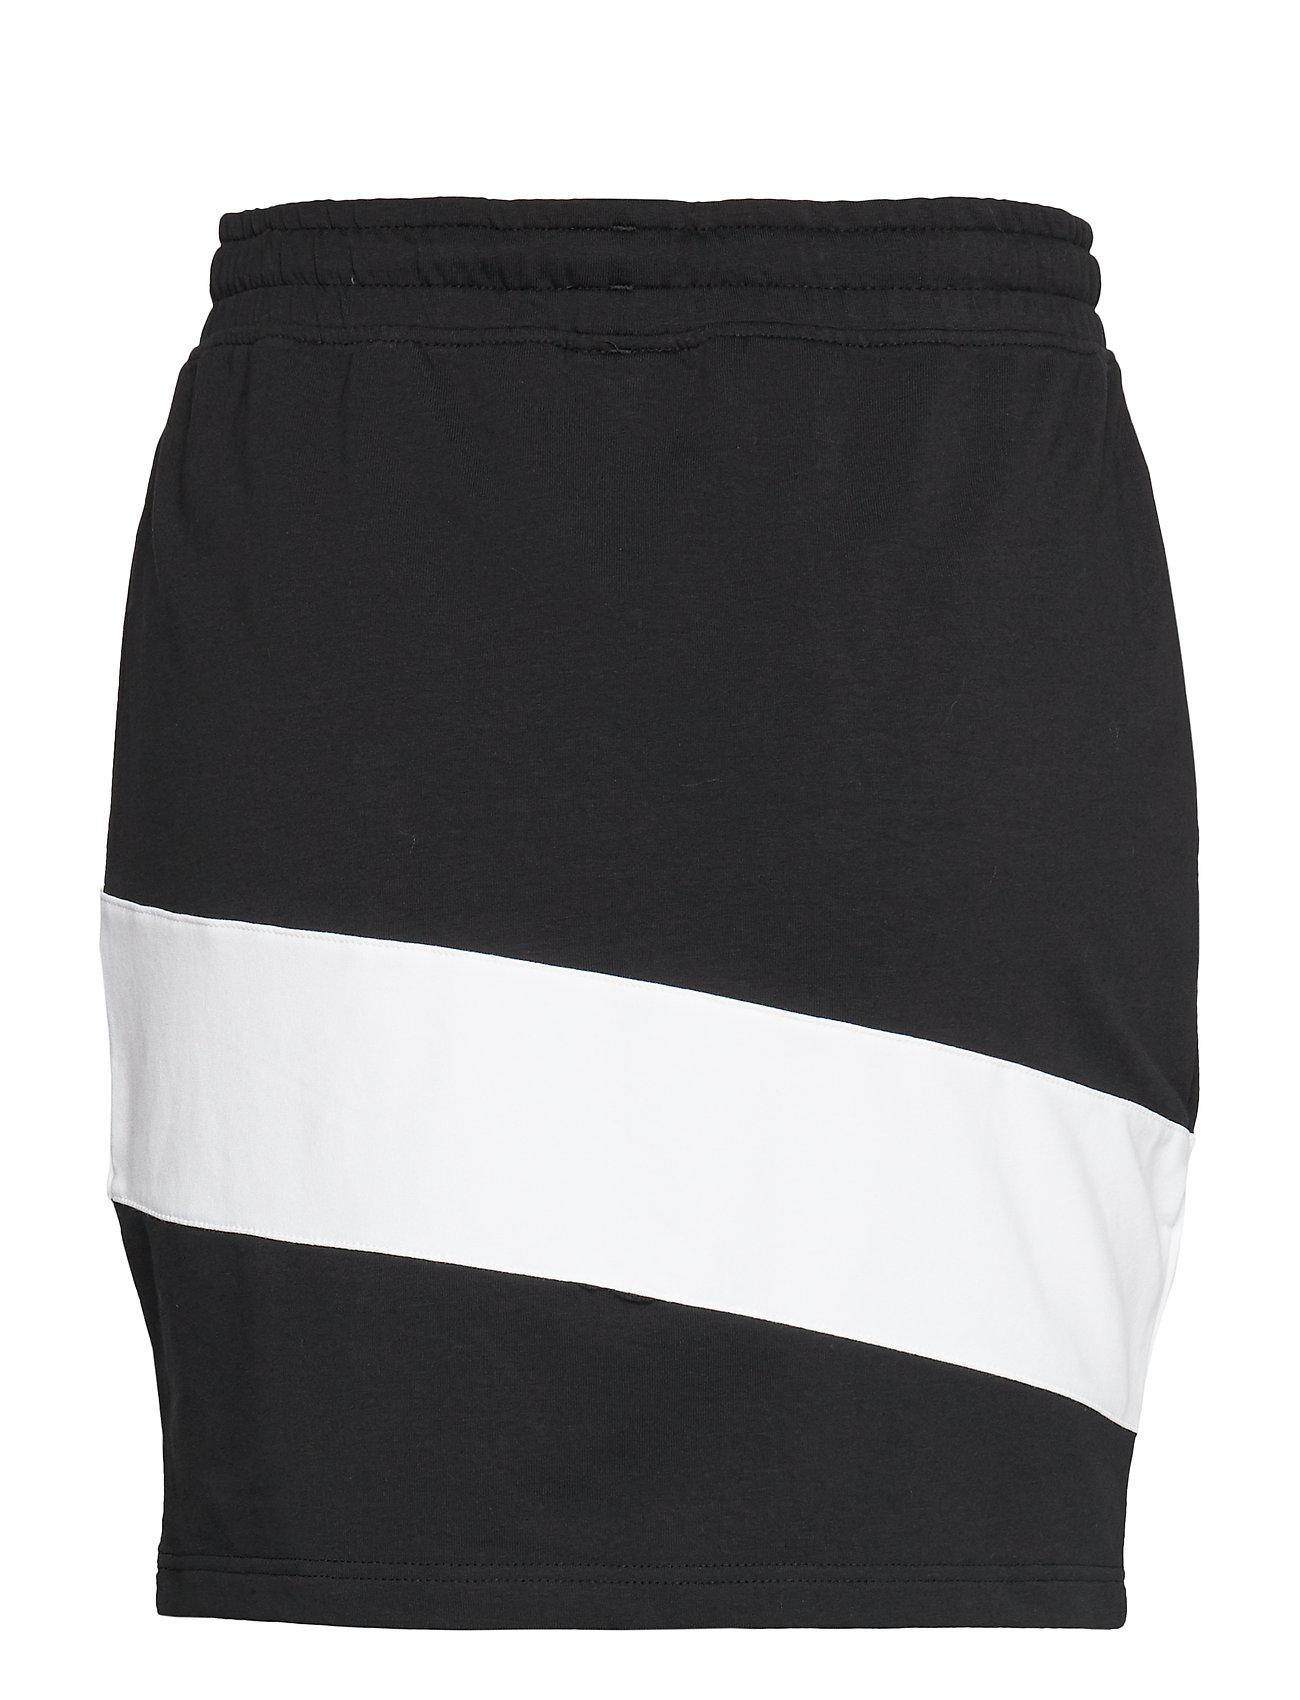 P Cl V Jersey Classics SkirtblackReebok UVLzMSpqG